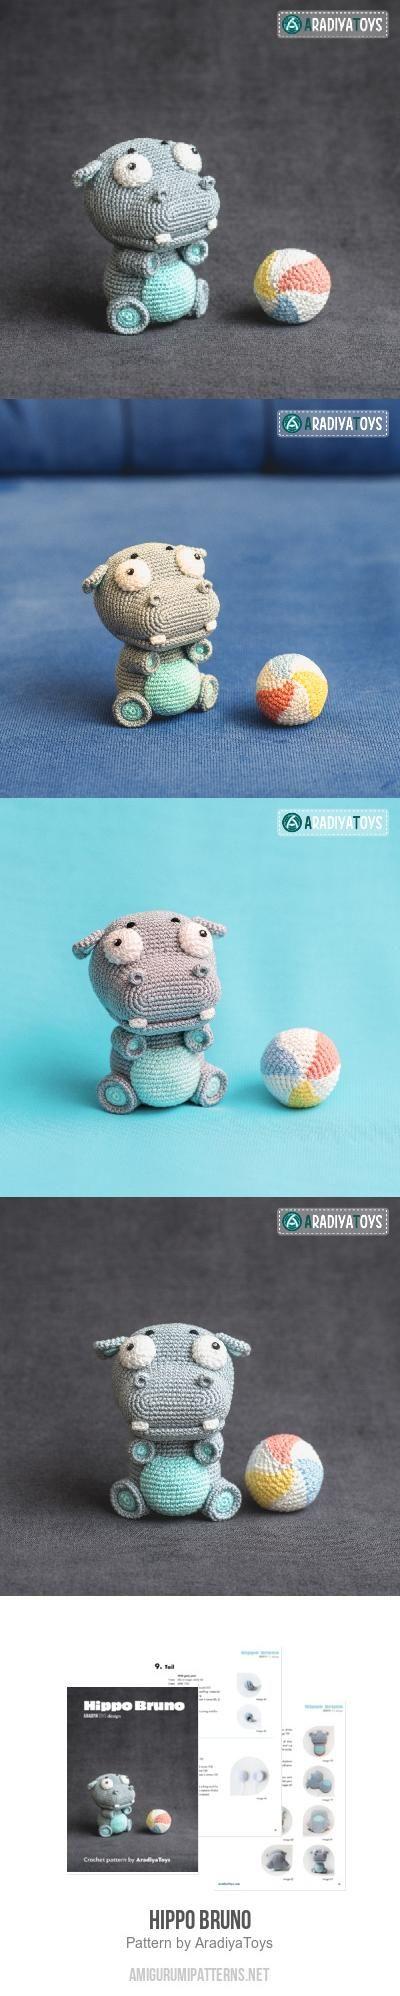 Hippo Bruno amigurumi pattern